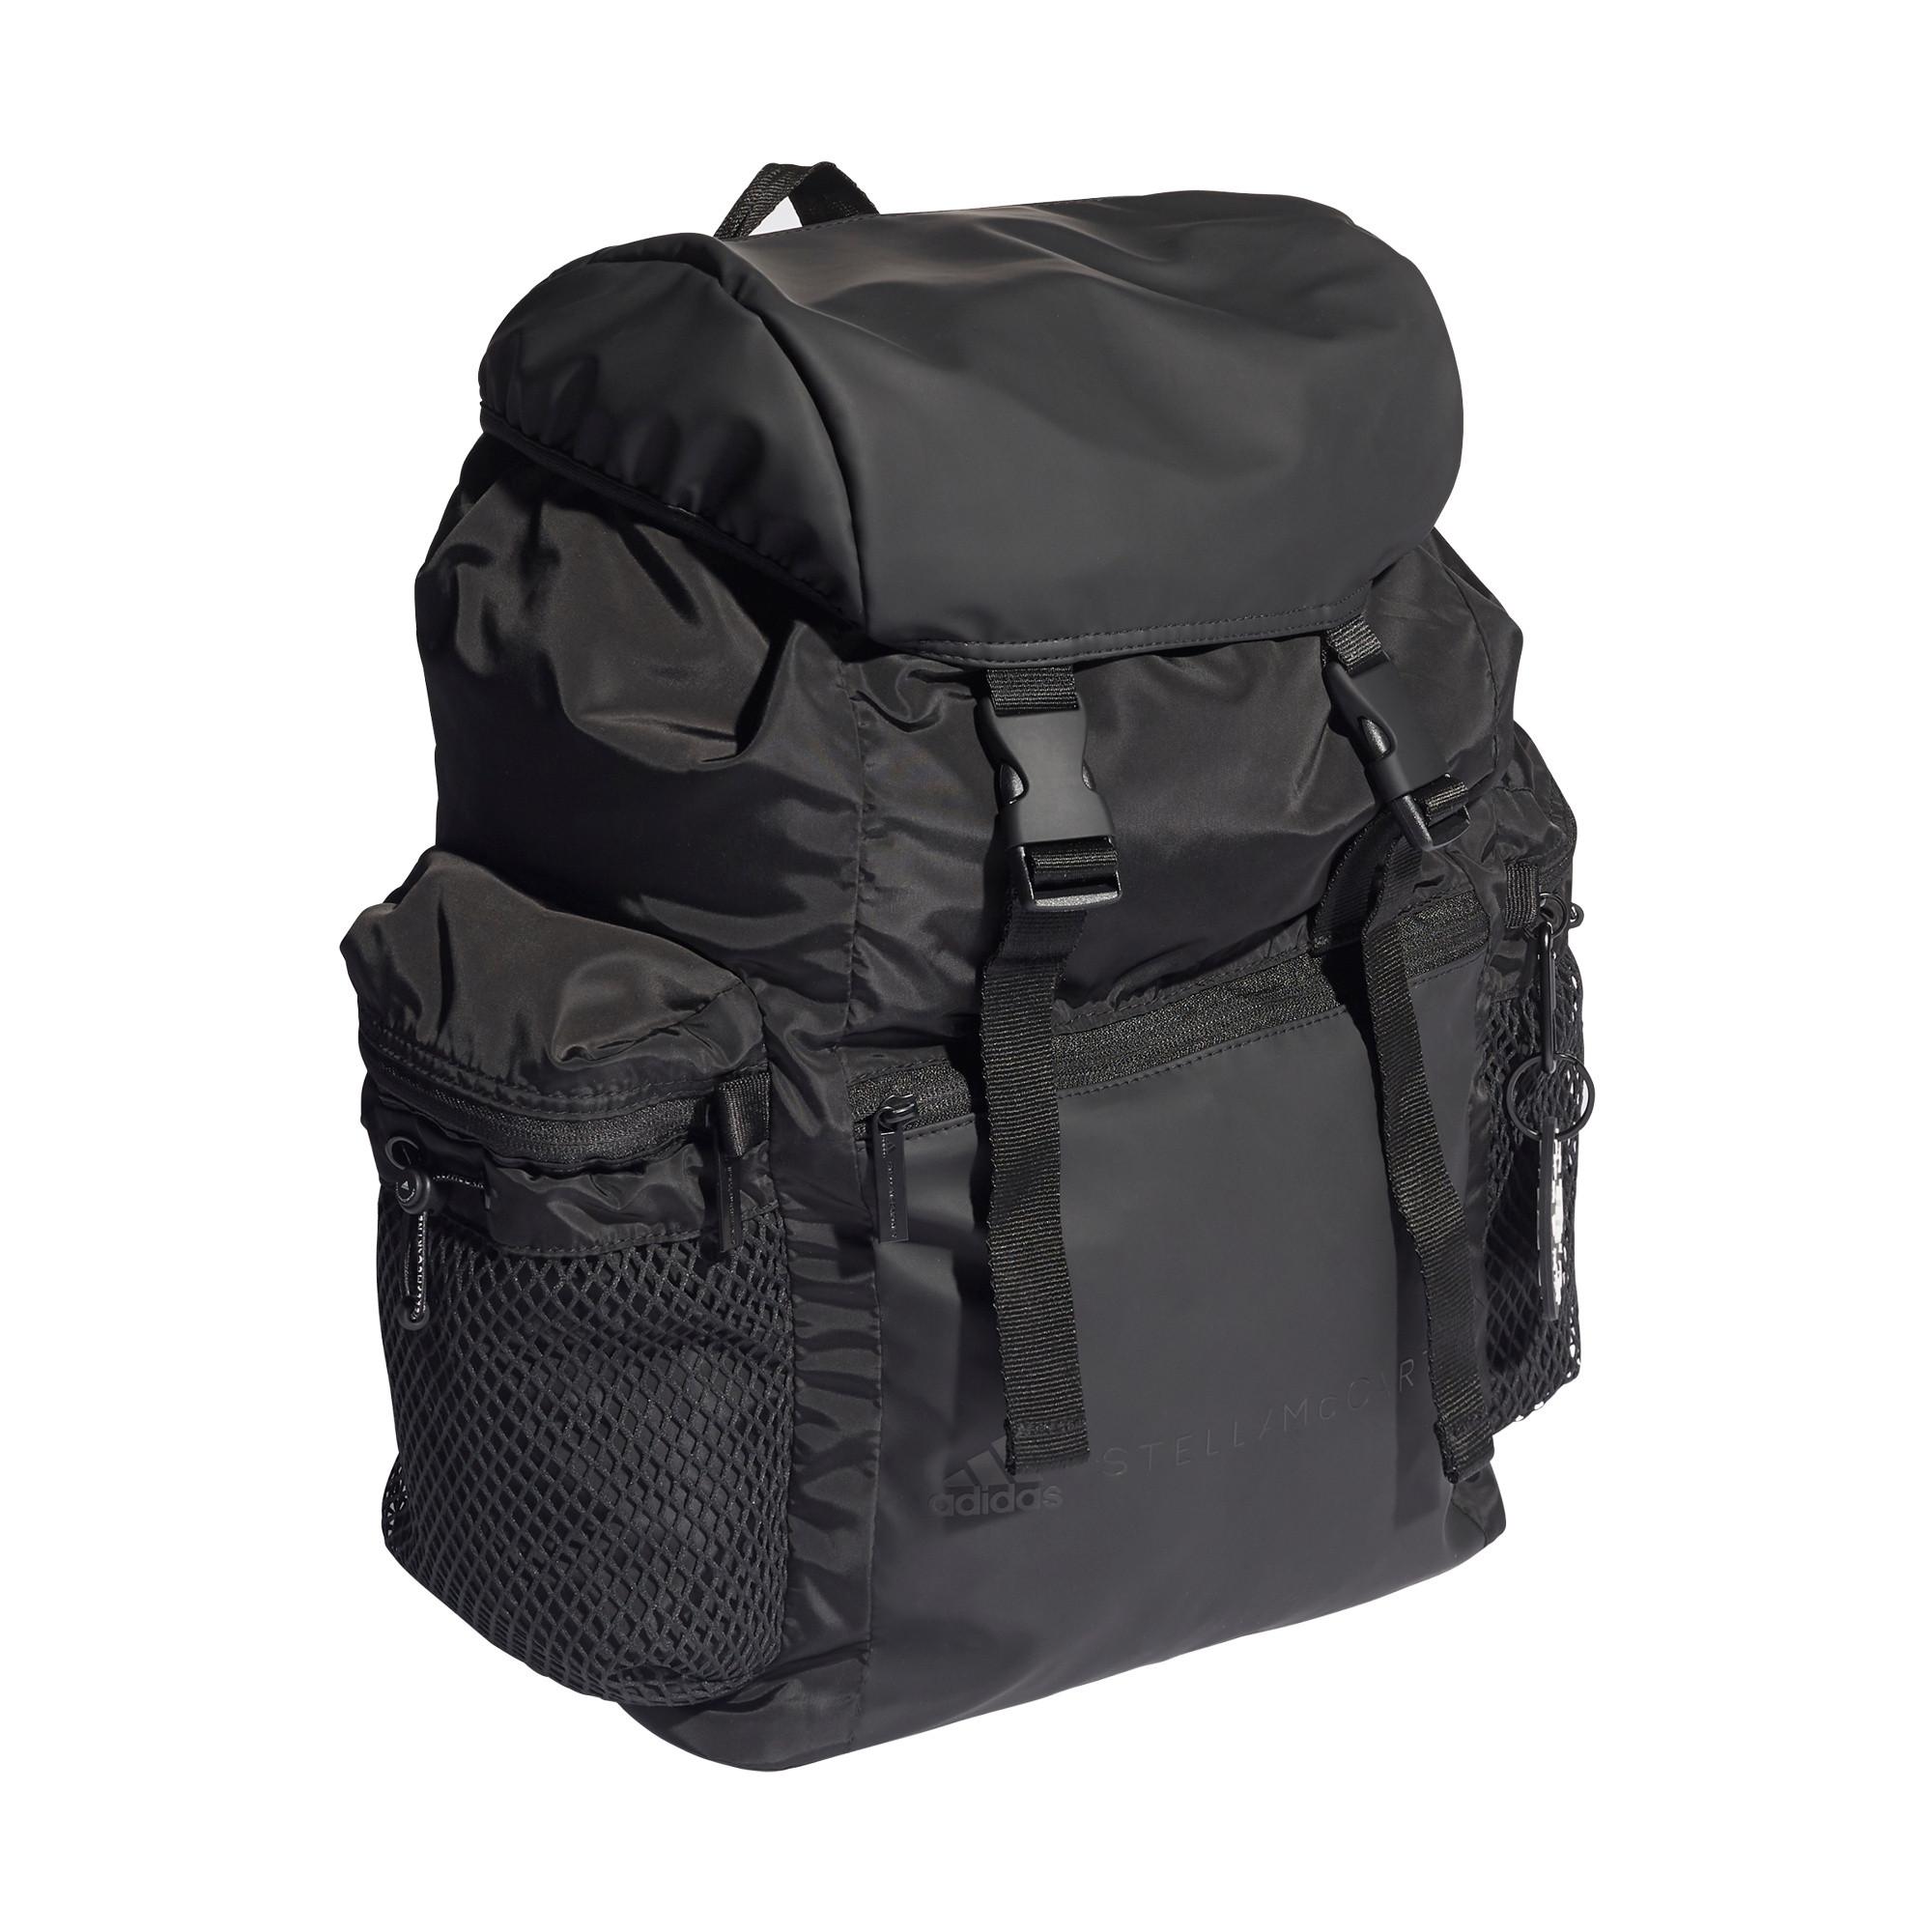 Zaino Asmc Backpack, Nero, large image number 6